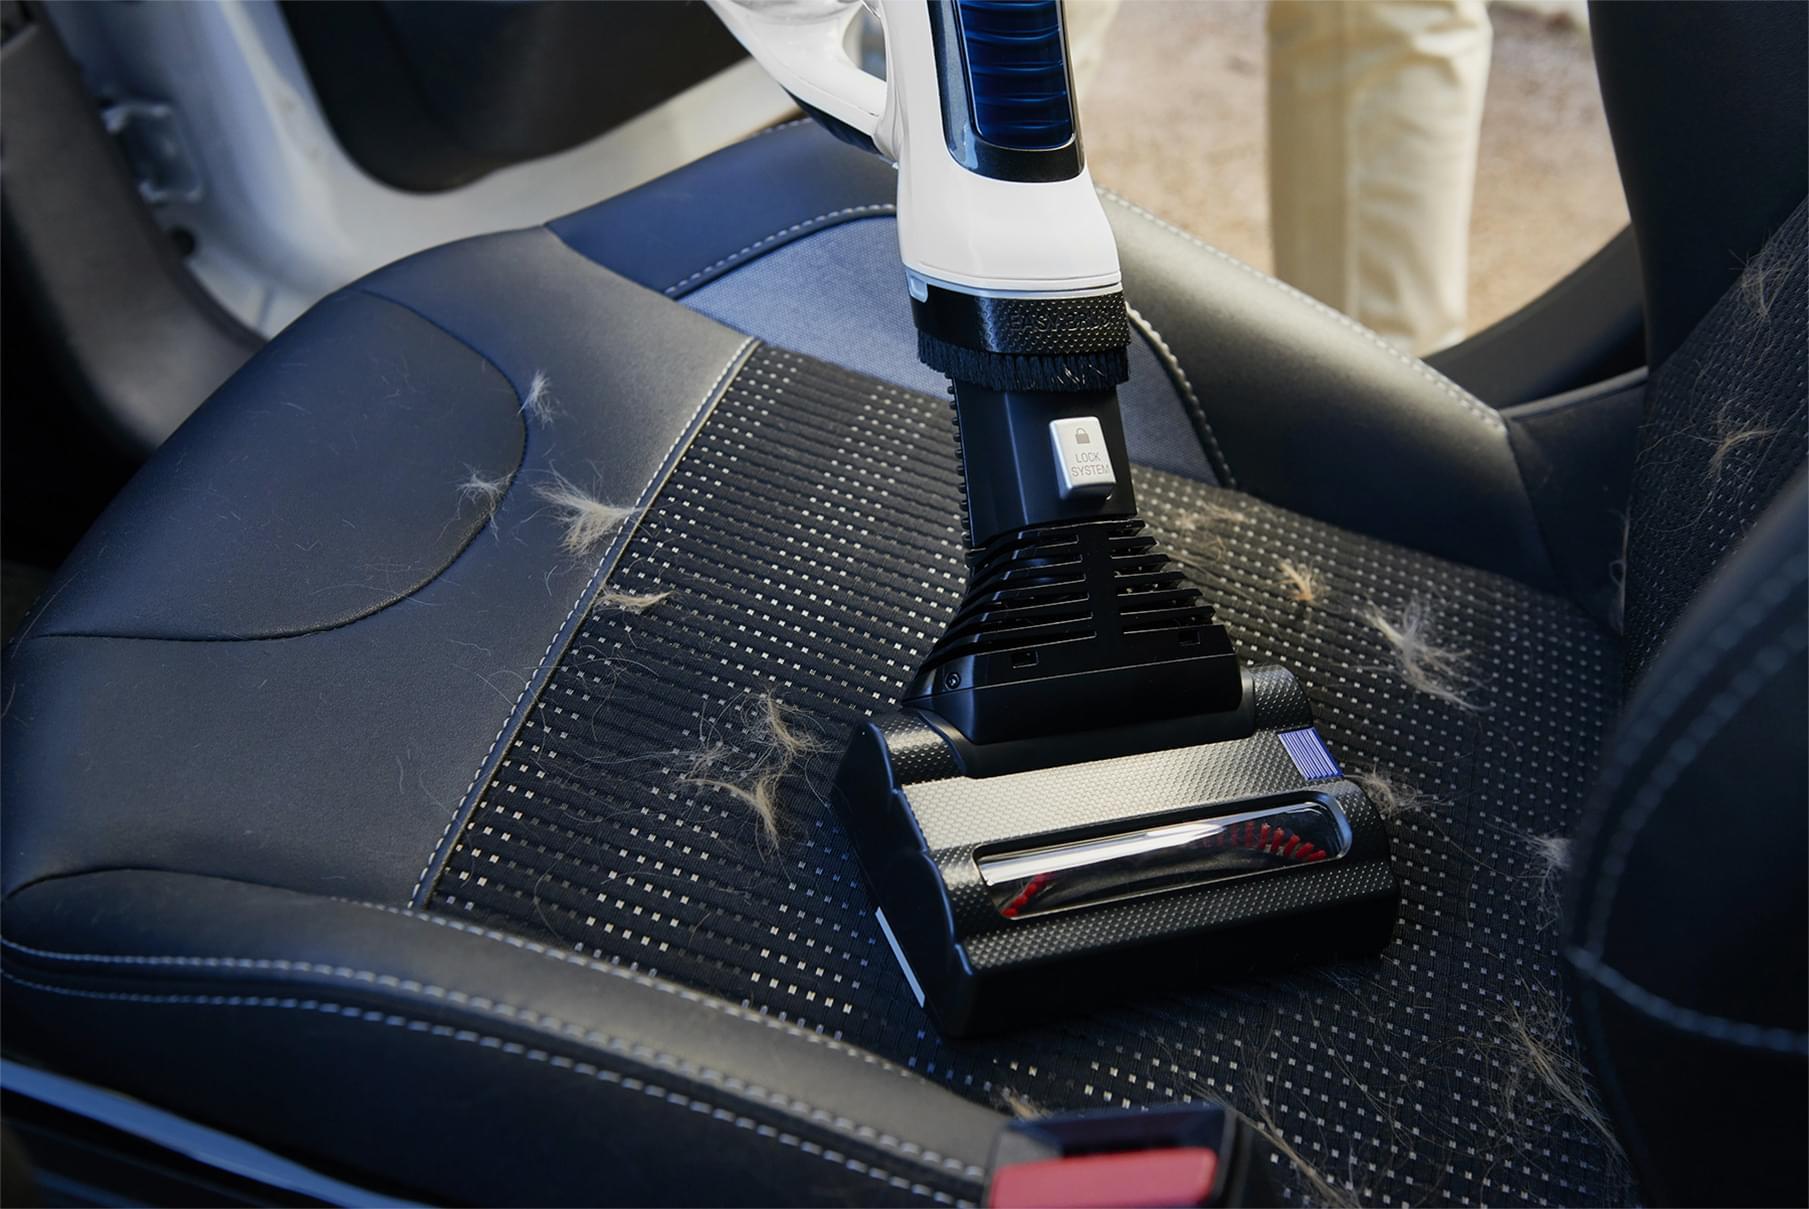 Mini electro brush in a car